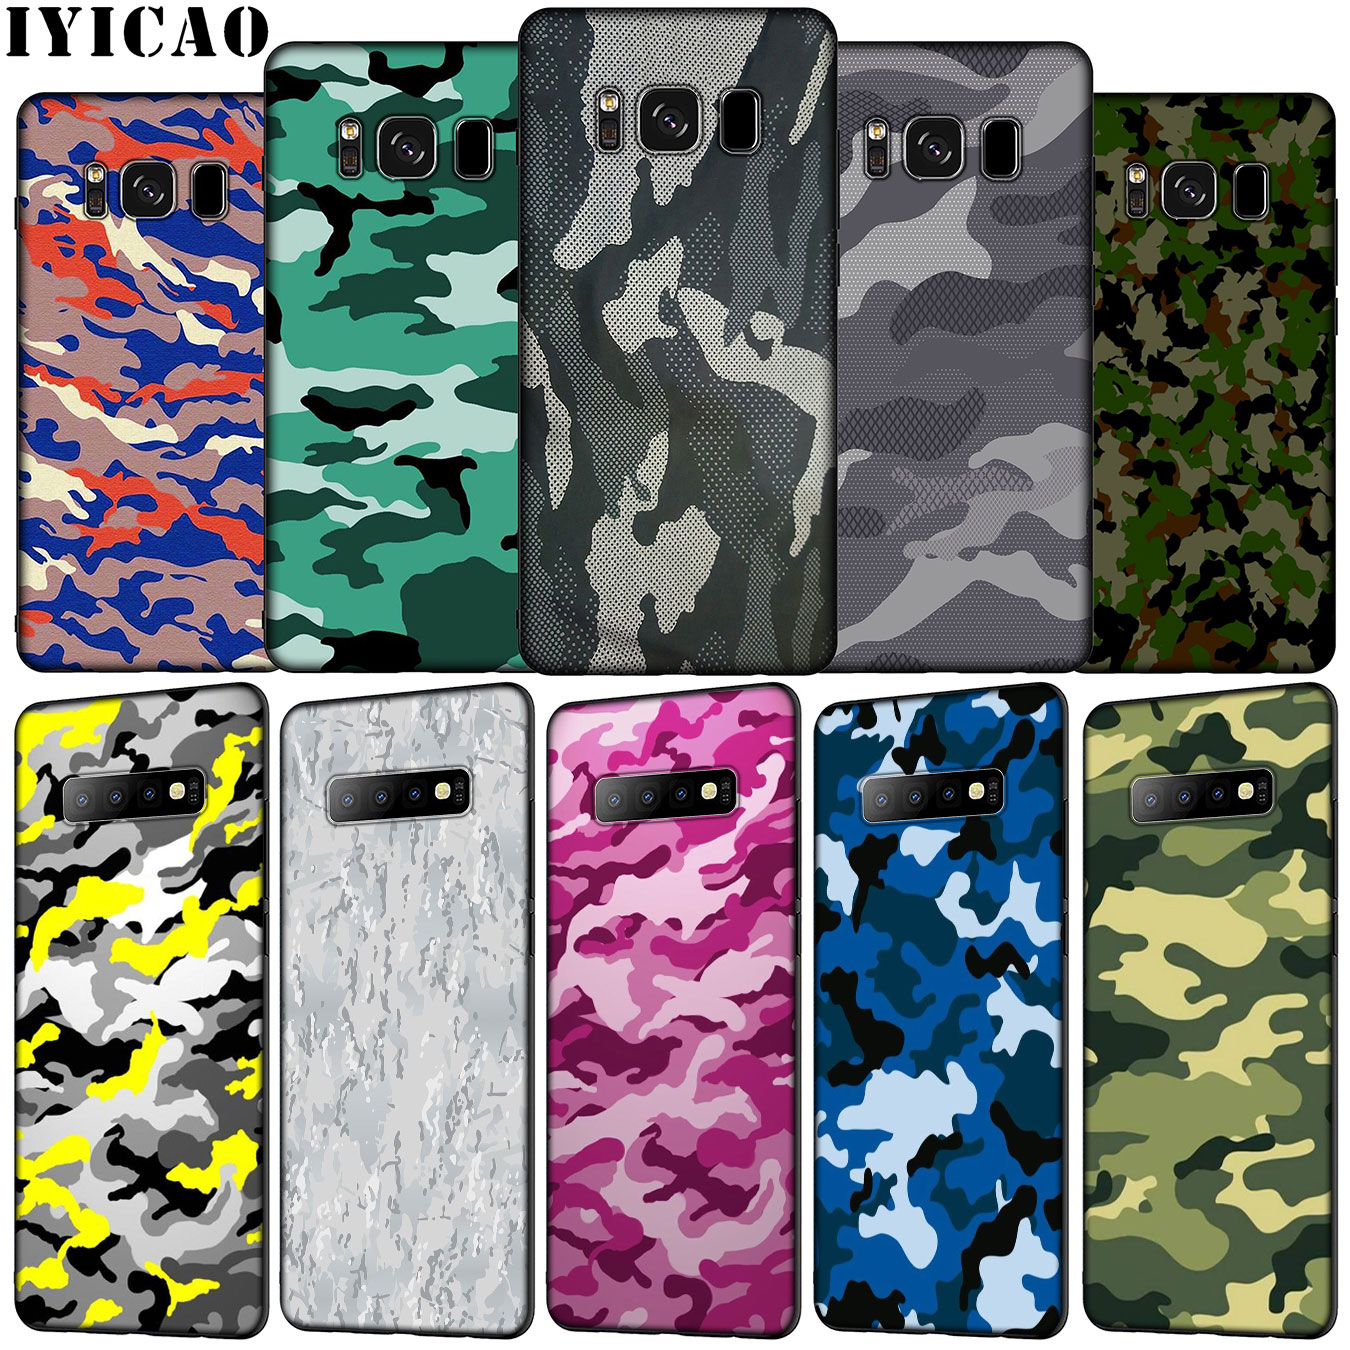 IYICAO de Camo del ejército camuflaje impresión patrón suave caso de teléfono para Samsung Galaxy S20 Ultra S10e S9 S8 más S6 S7 borde S10 Lite